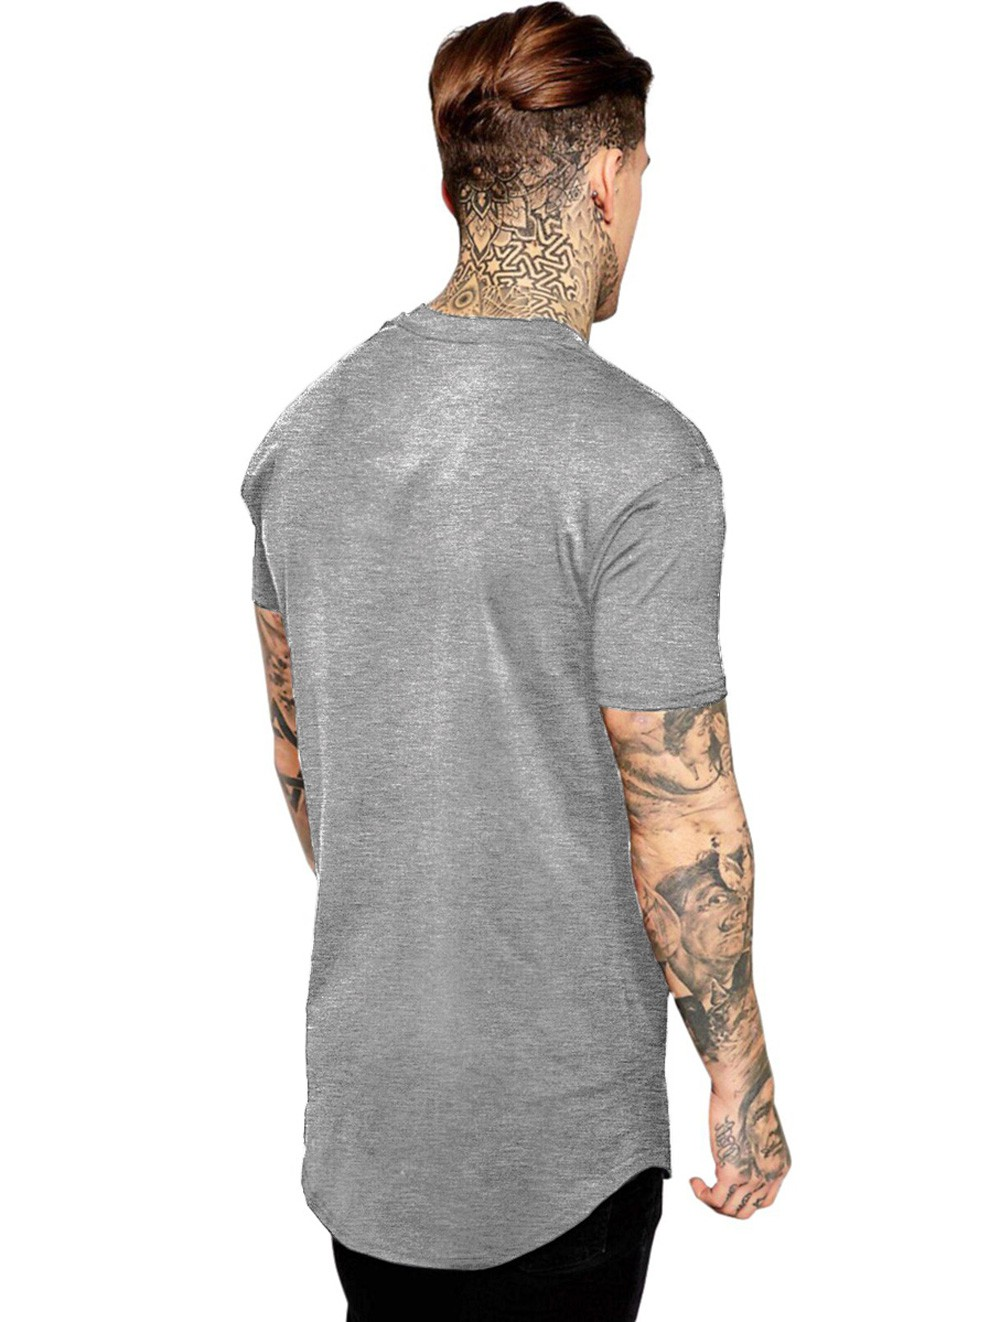 Camiseta Masculina Oversized Long Line Long Live The Beard ES_207